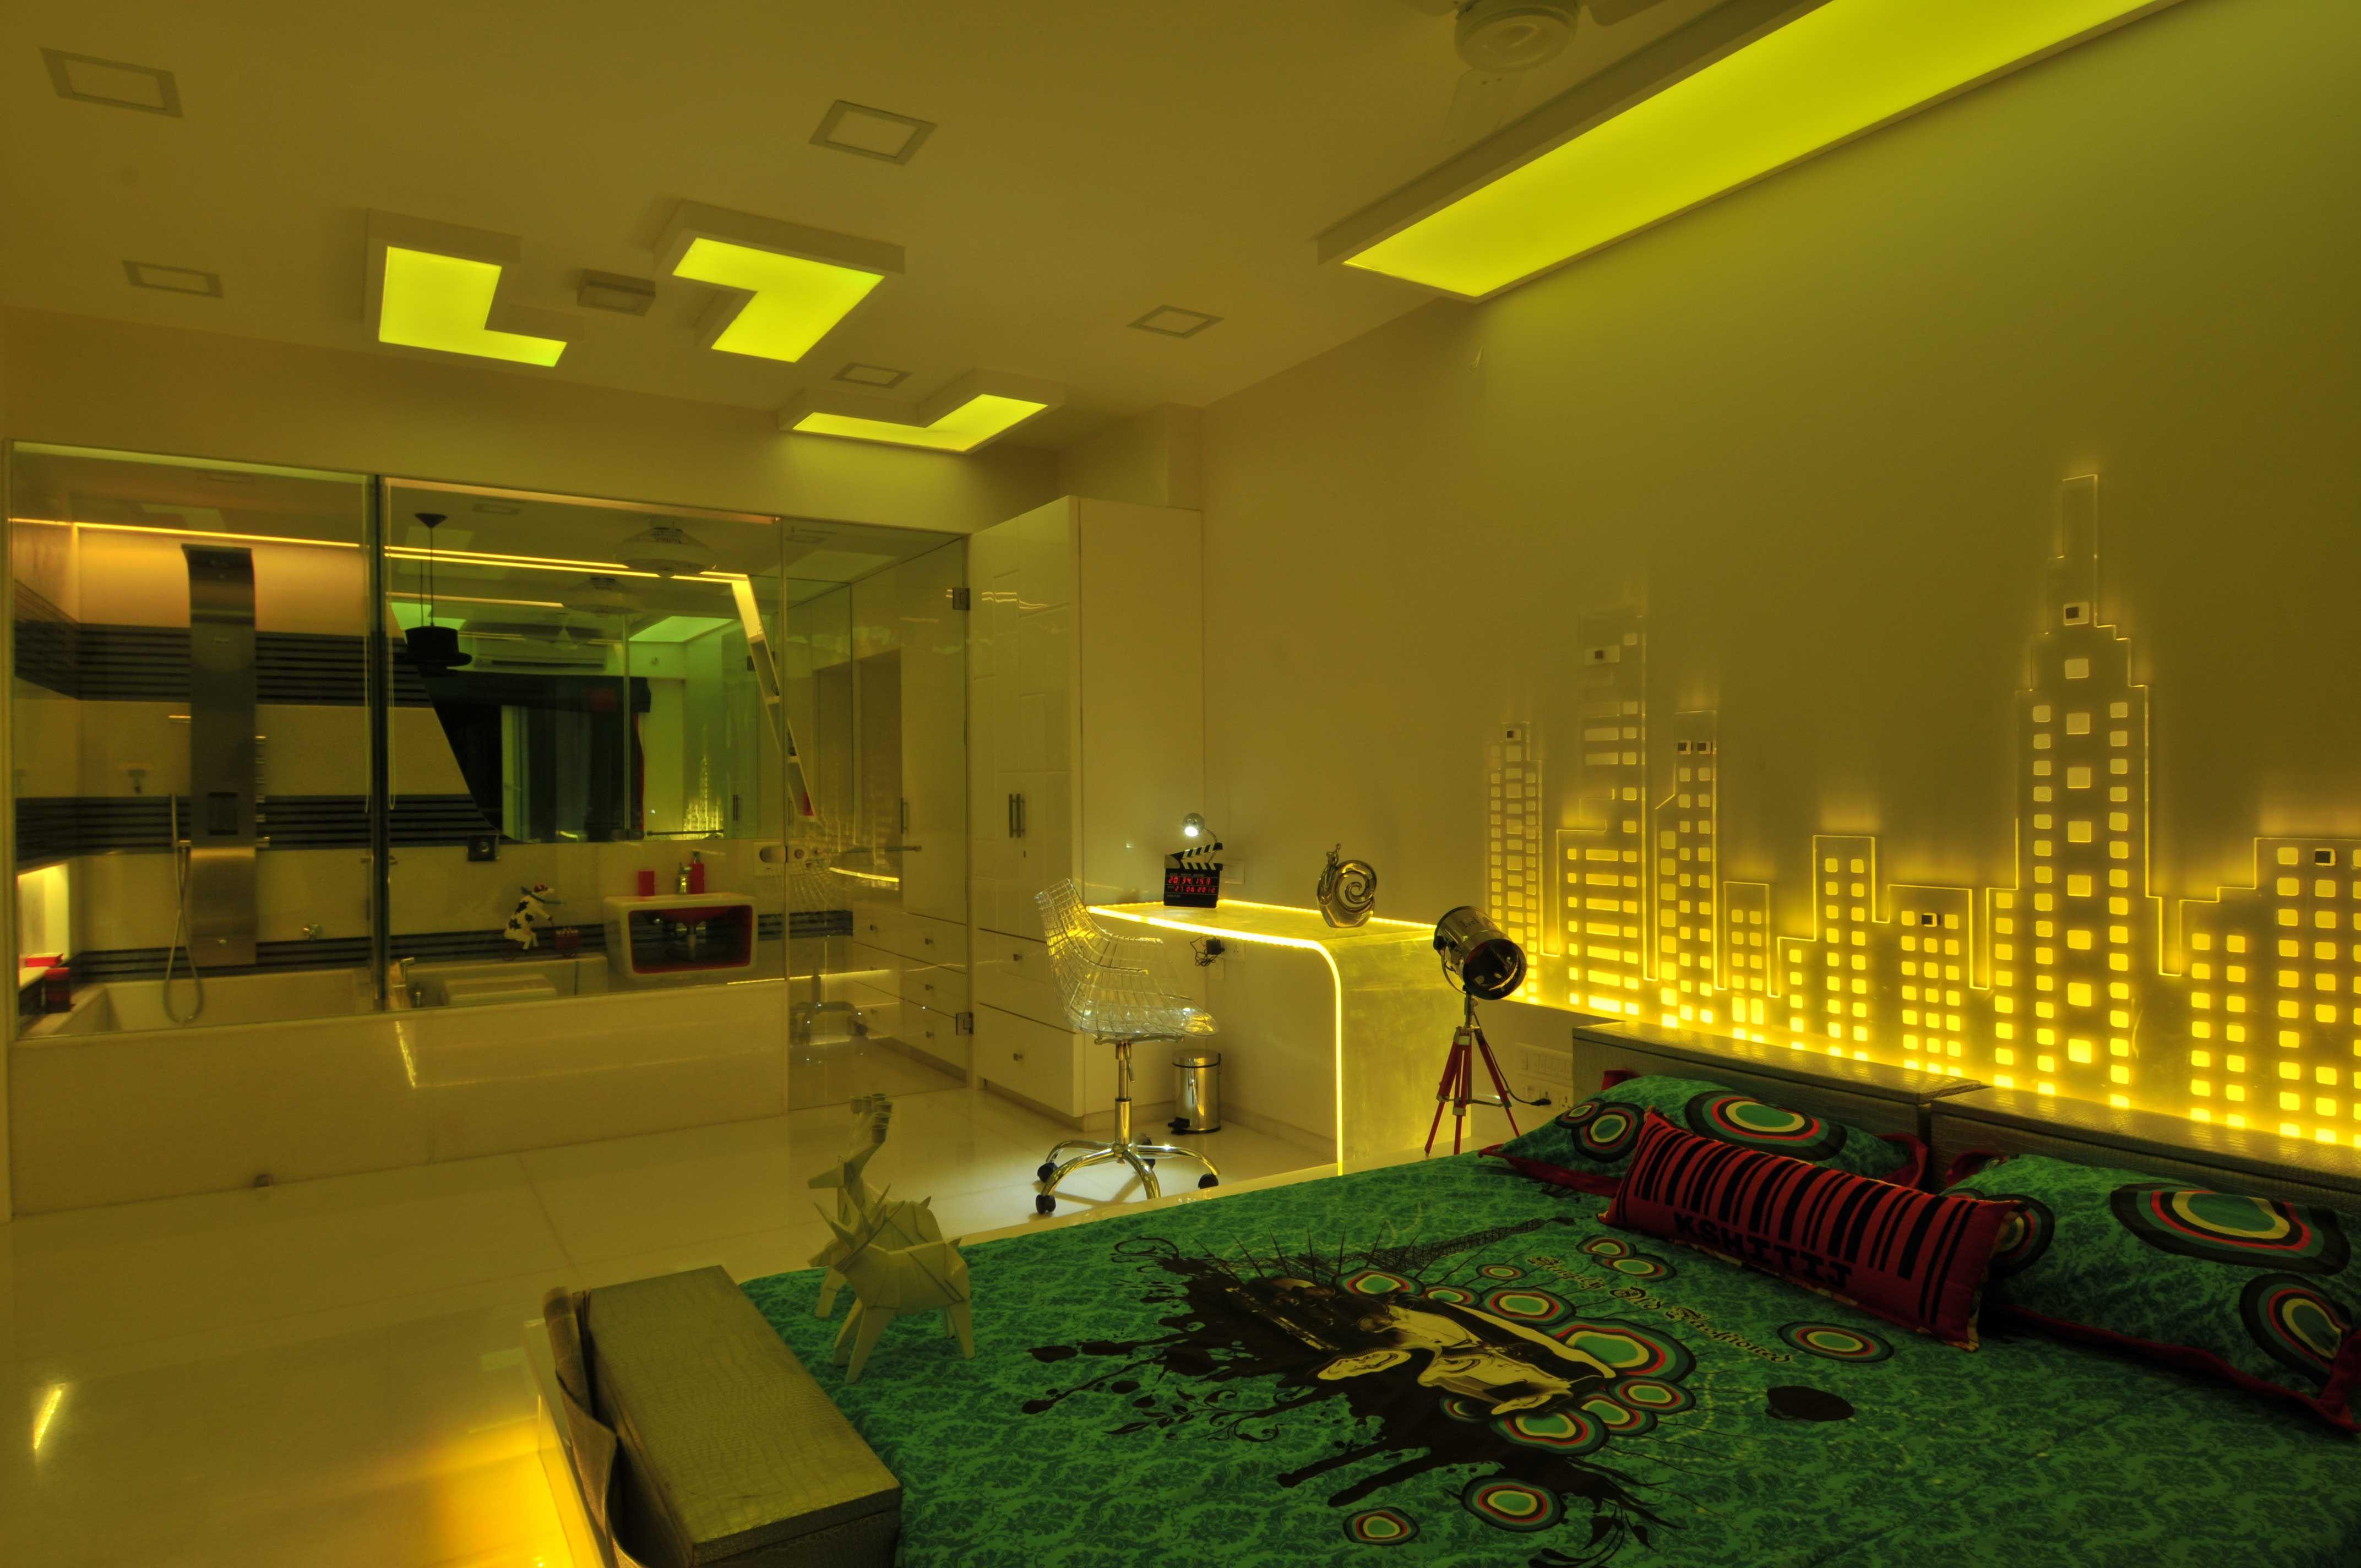 Luxury Bedroom With Neon Light Design By Architect Sonali Shah Mumbai India